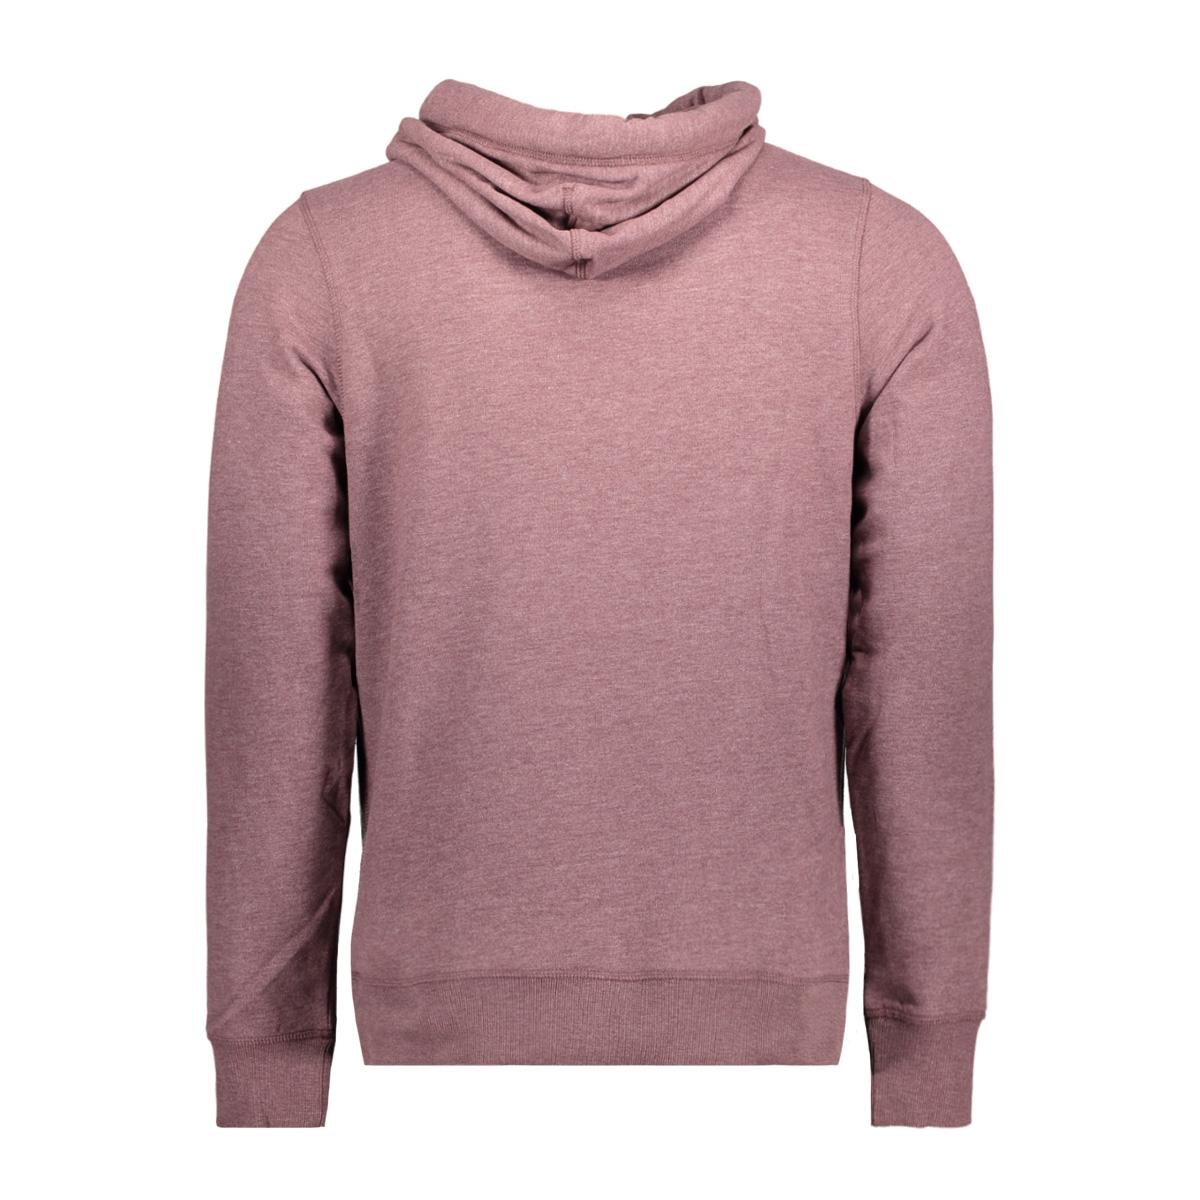 jorheritage sweat cross over hood 12127799 jack & jones sweater sassafras/ slim melan